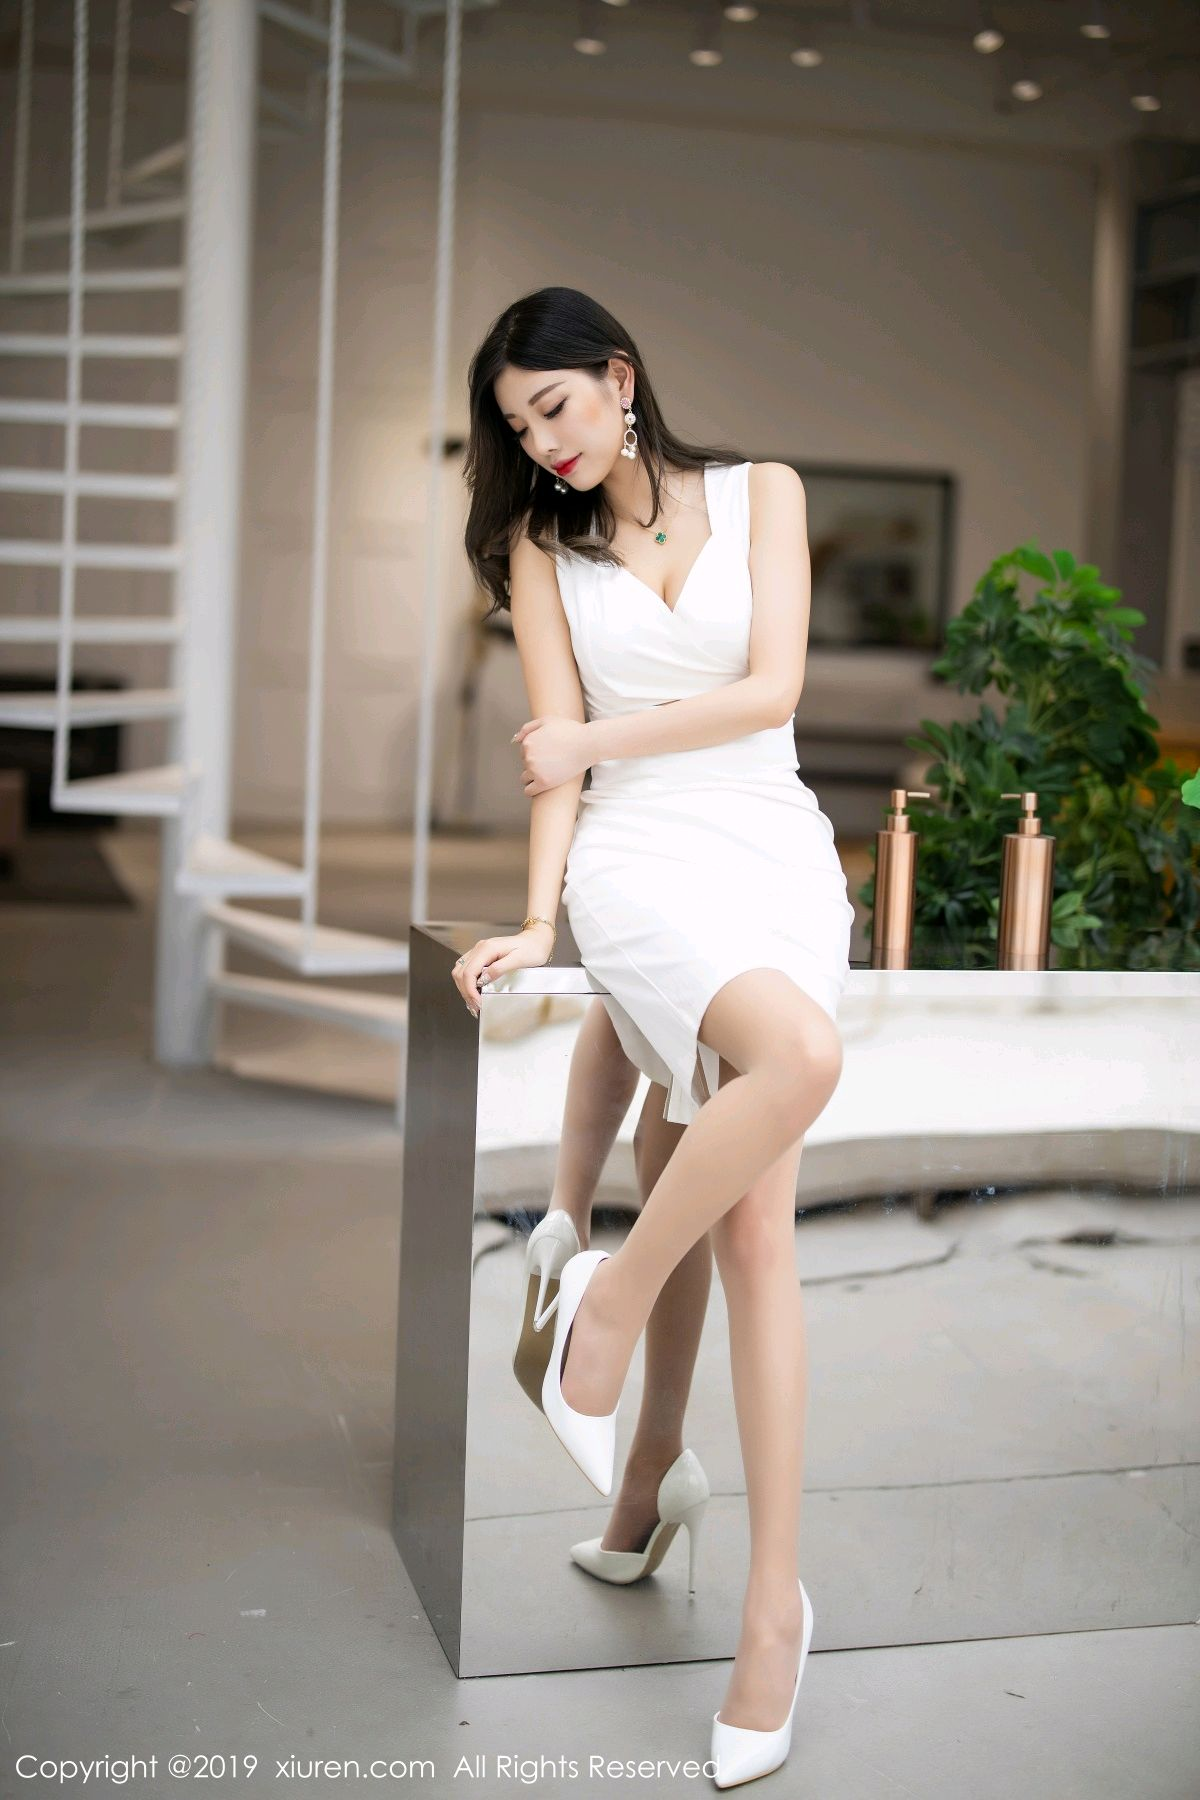 [XiuRen] Vol.1695 Yang Chen Chen 15P, Foot, Tall, Underwear, Xiuren, Yang Chen Chen